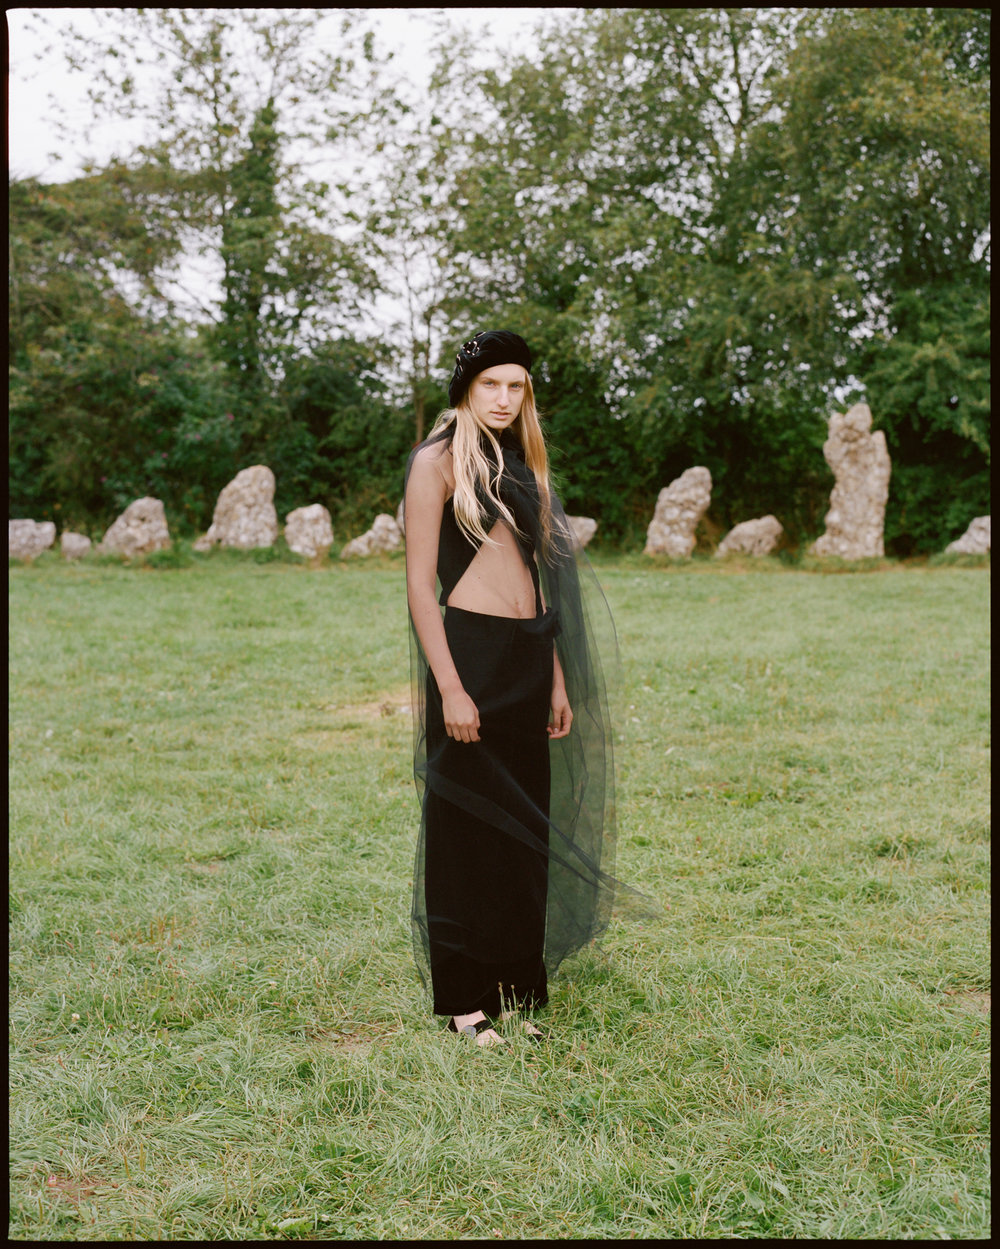 amber_mahoney_lula_japan_english_countryside_fashion_editorial_film_018.jpg